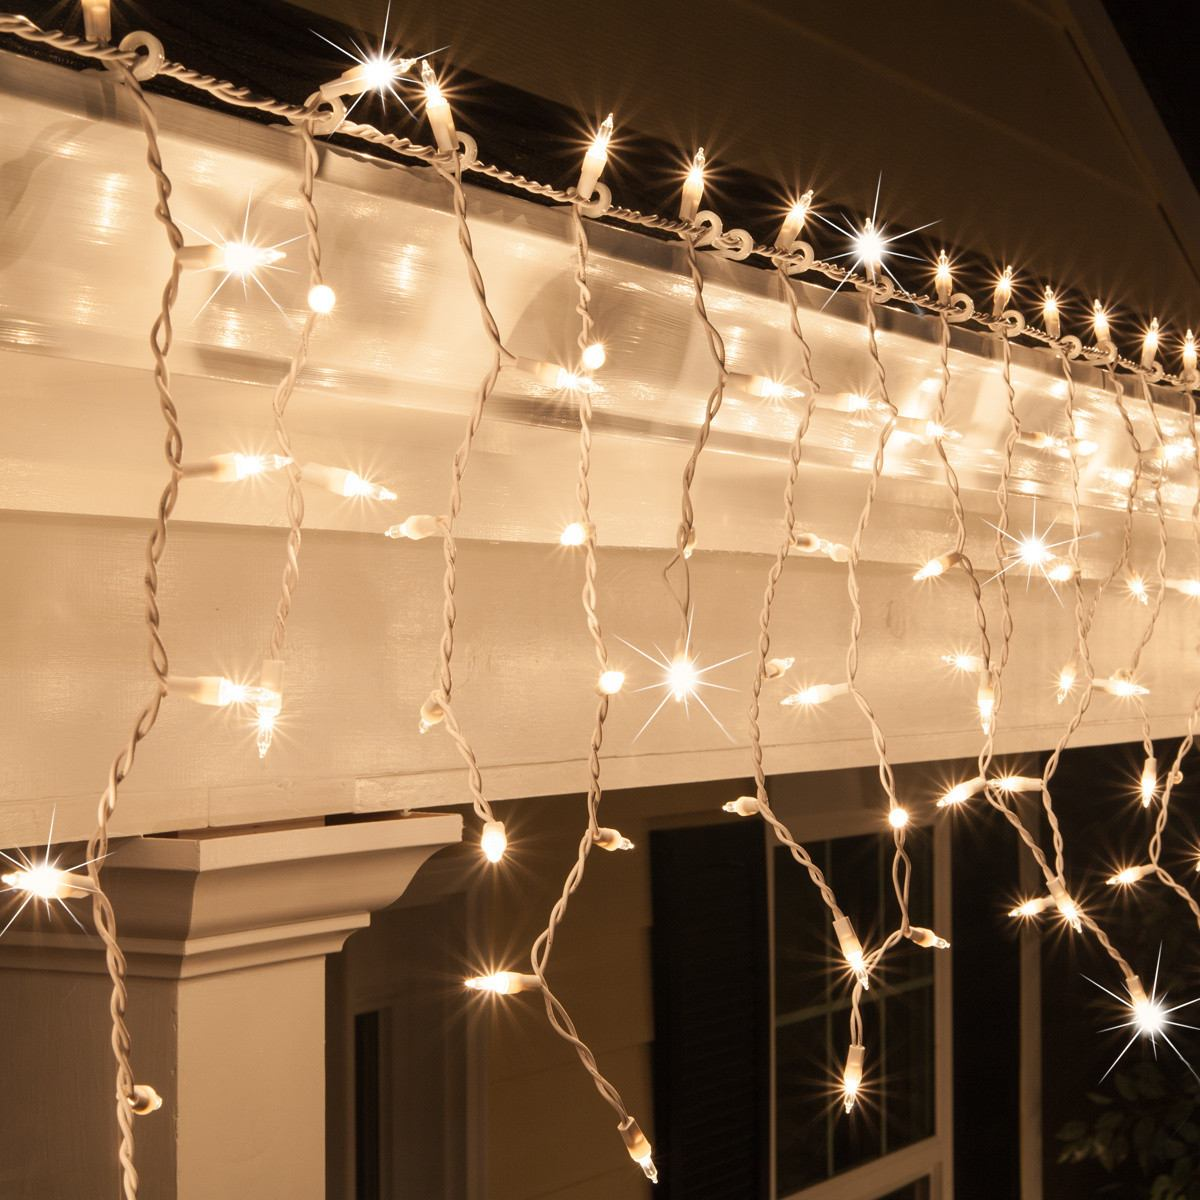 a6167722a8c luces lluvia cascada calidas 160x40 casamiento arbol navidad. Cargando zoom.